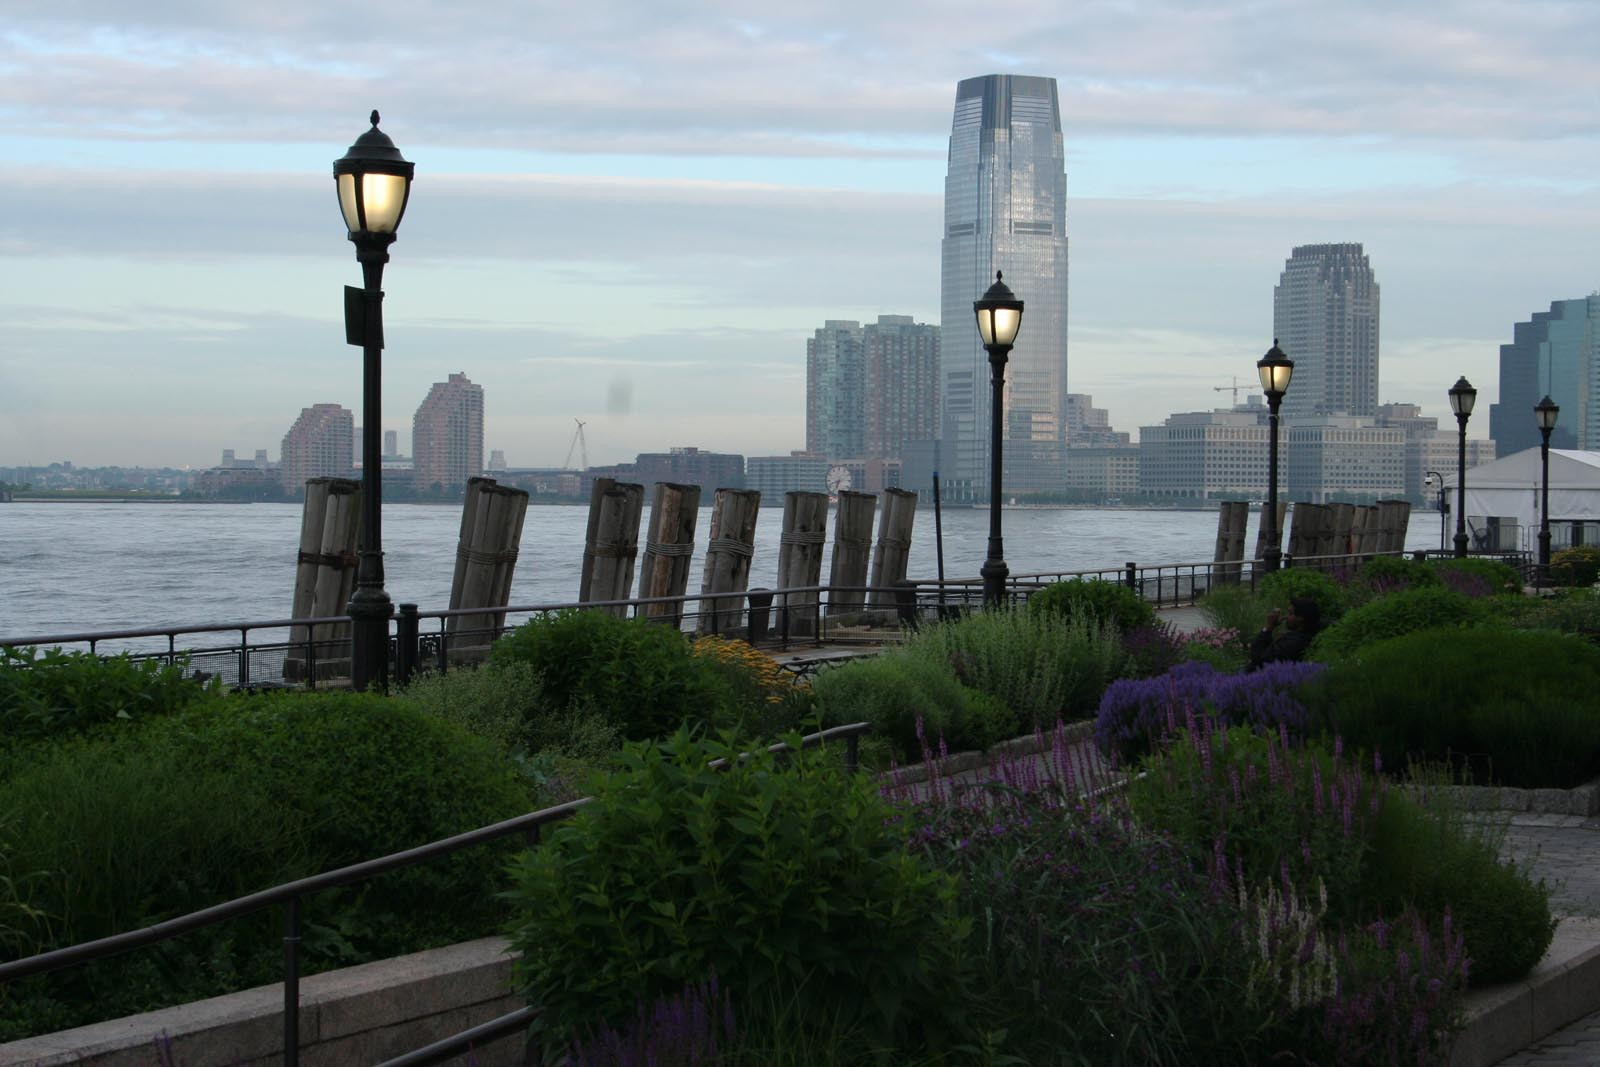 Poemas Del R O Wang The Battery Gardens